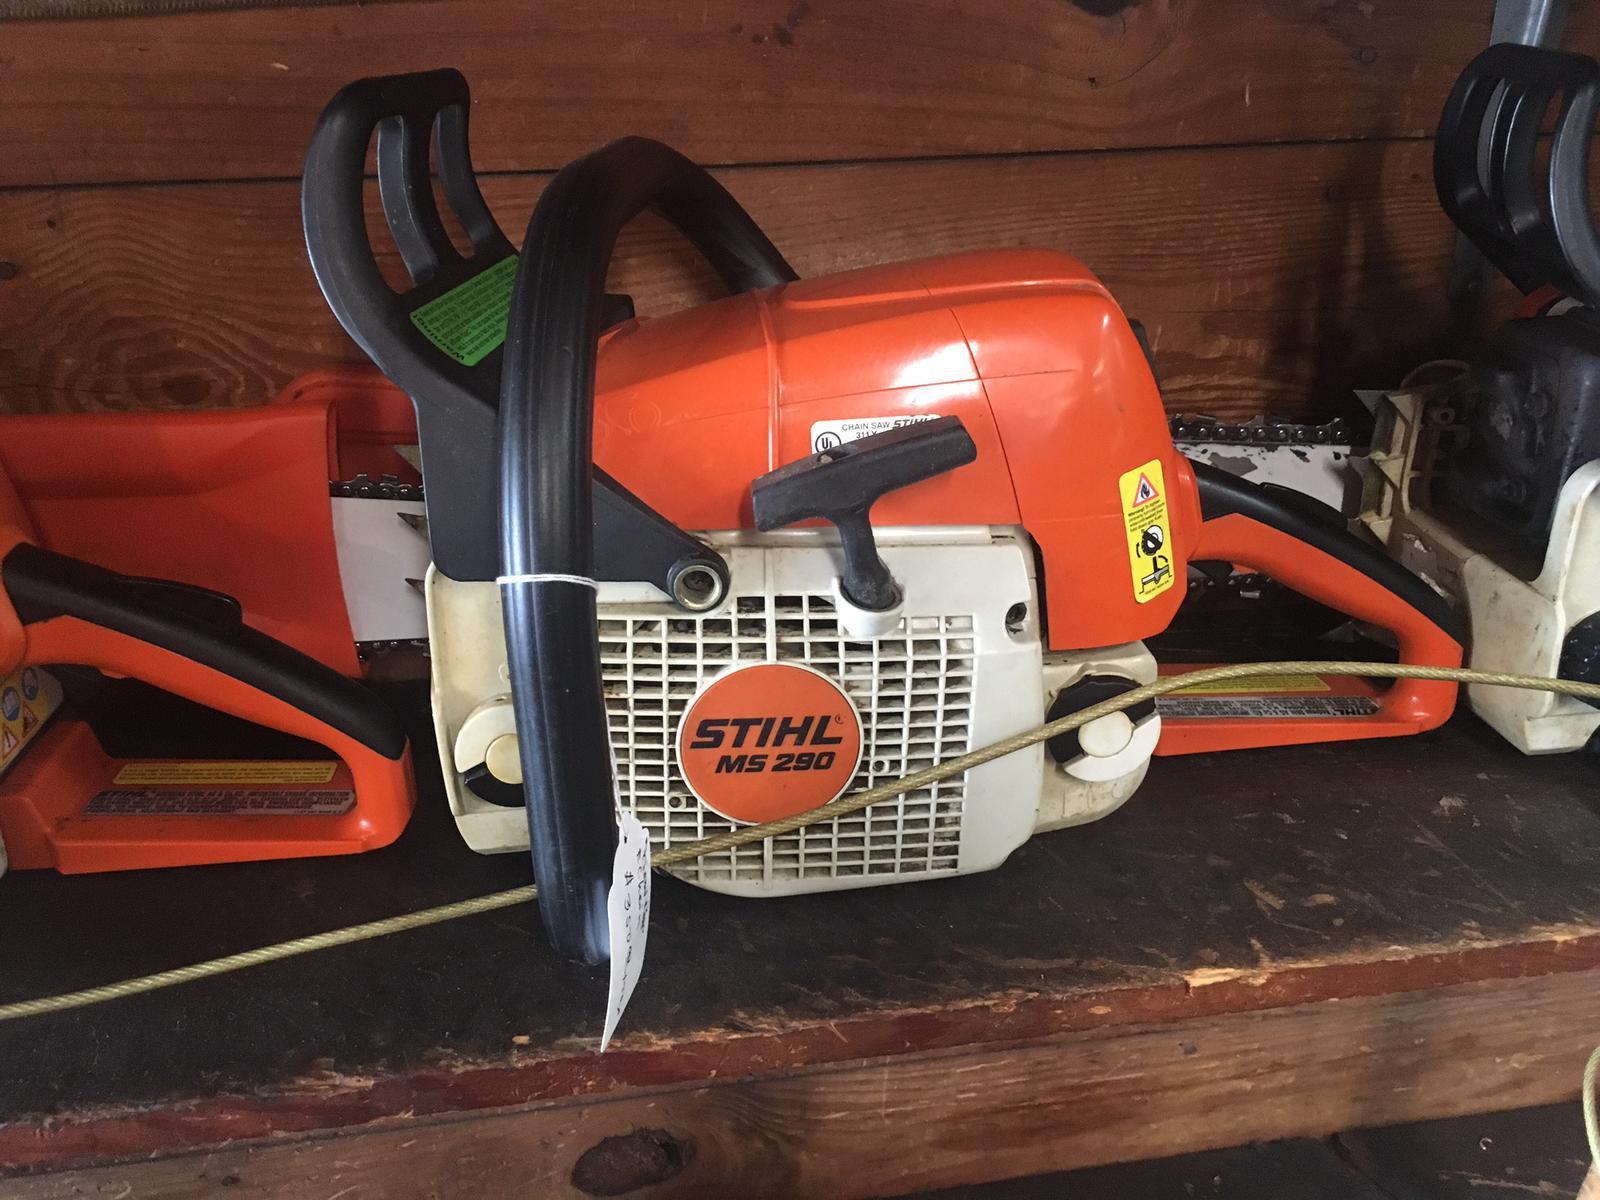 small resolution of 2010 stihl ms 290 farm boss chain saw for sale in lynn in polley farm service inc 765 874 2291